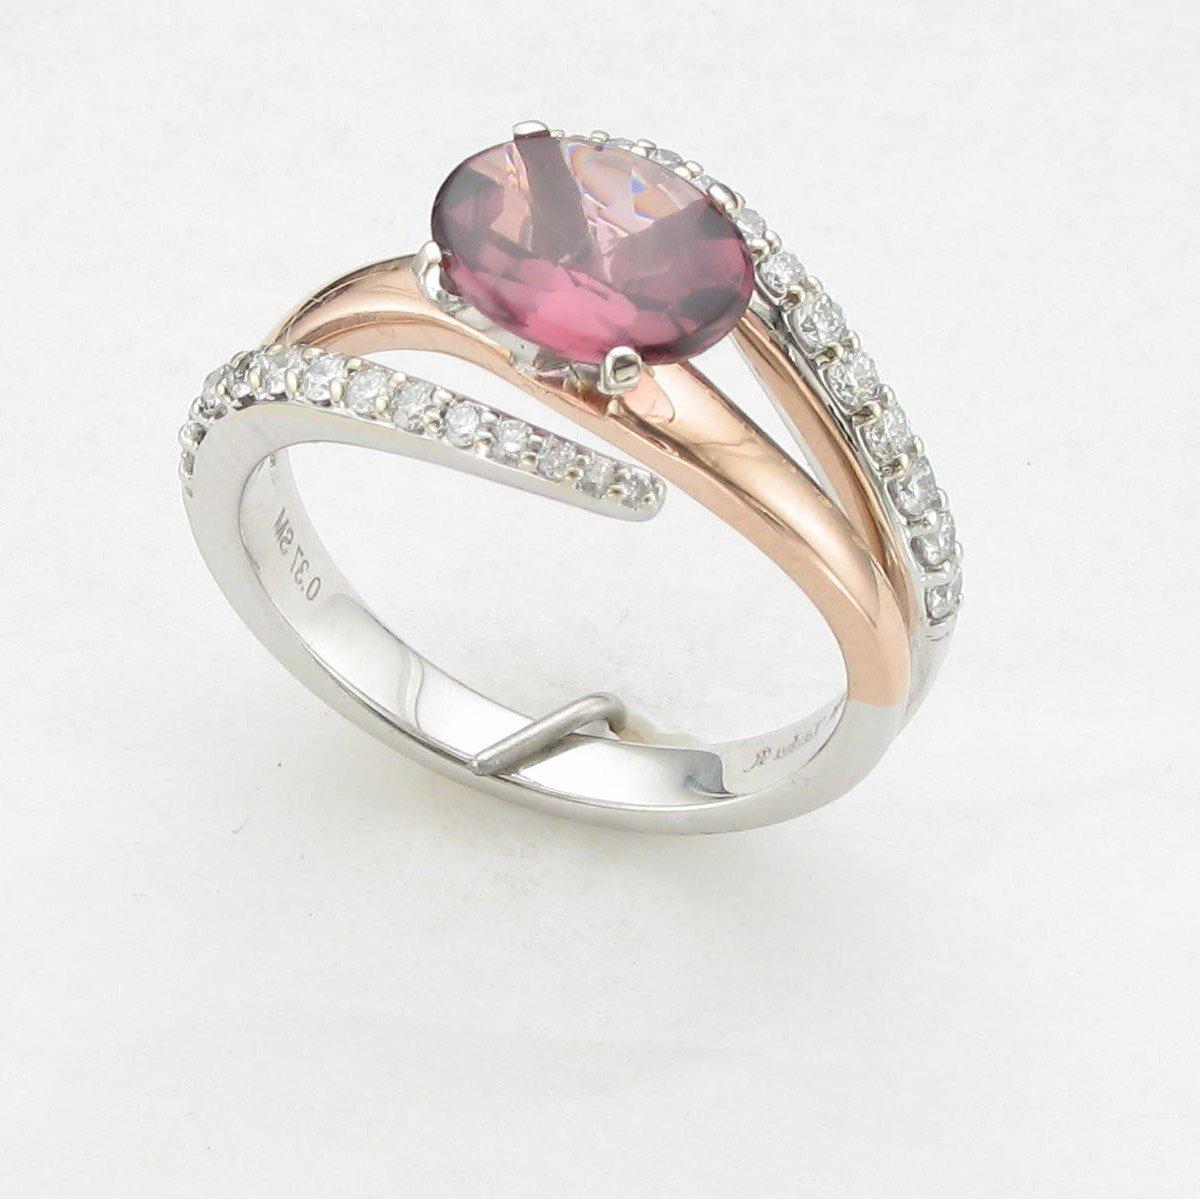 14K Two-Tone Rose and White Gold Diamond Garnet Ring